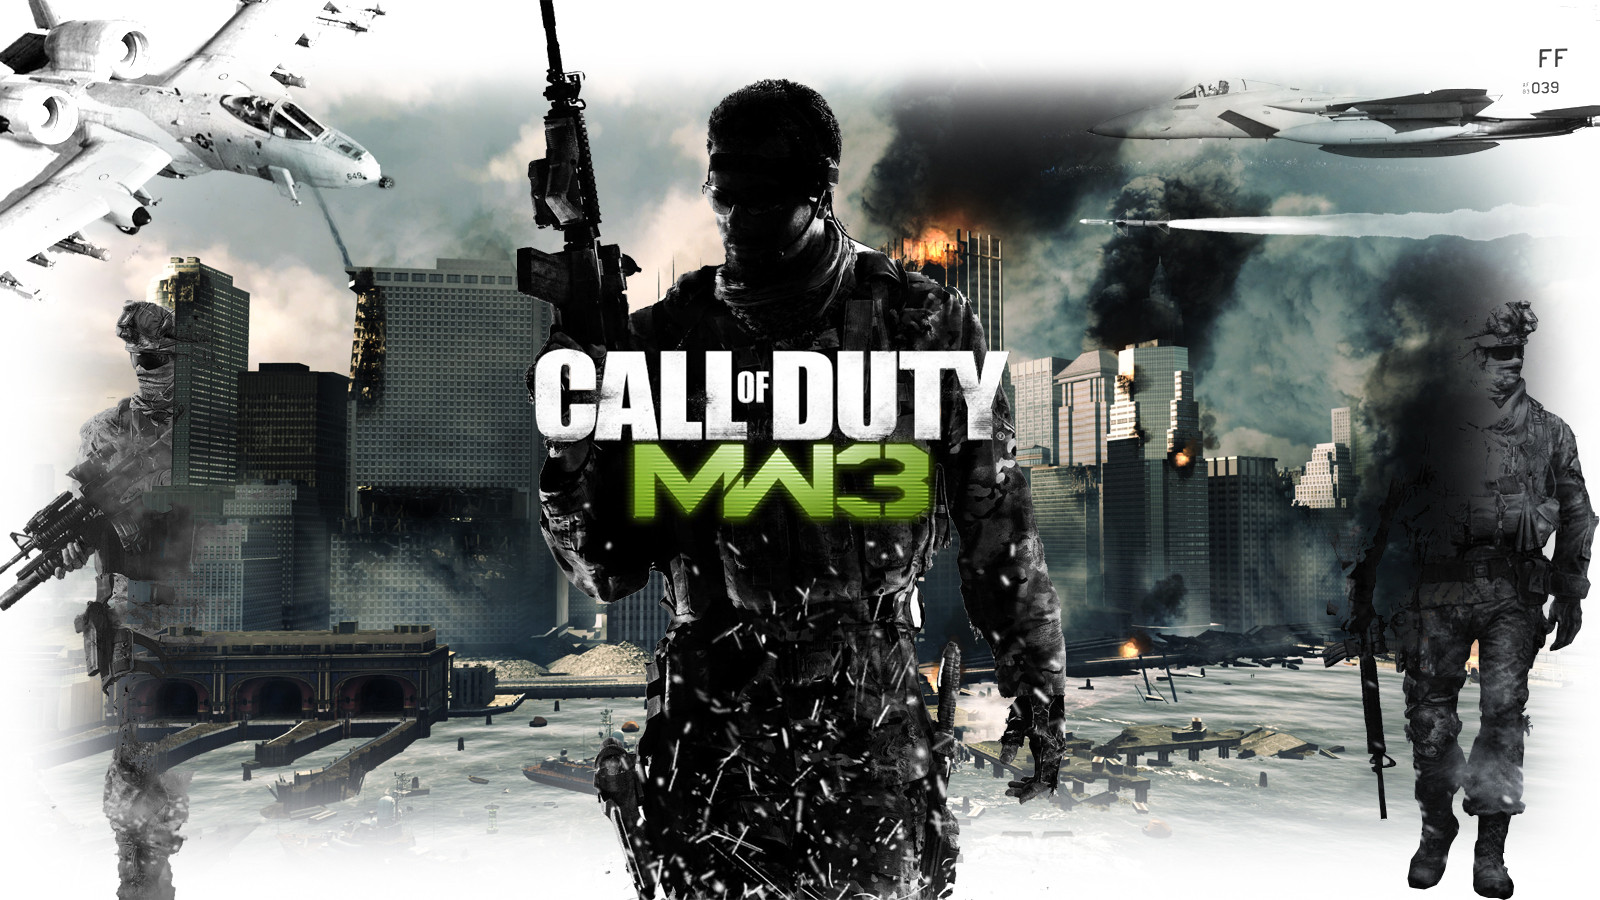 Call Of Duty Modern Warfare 3 Wallpaper 6